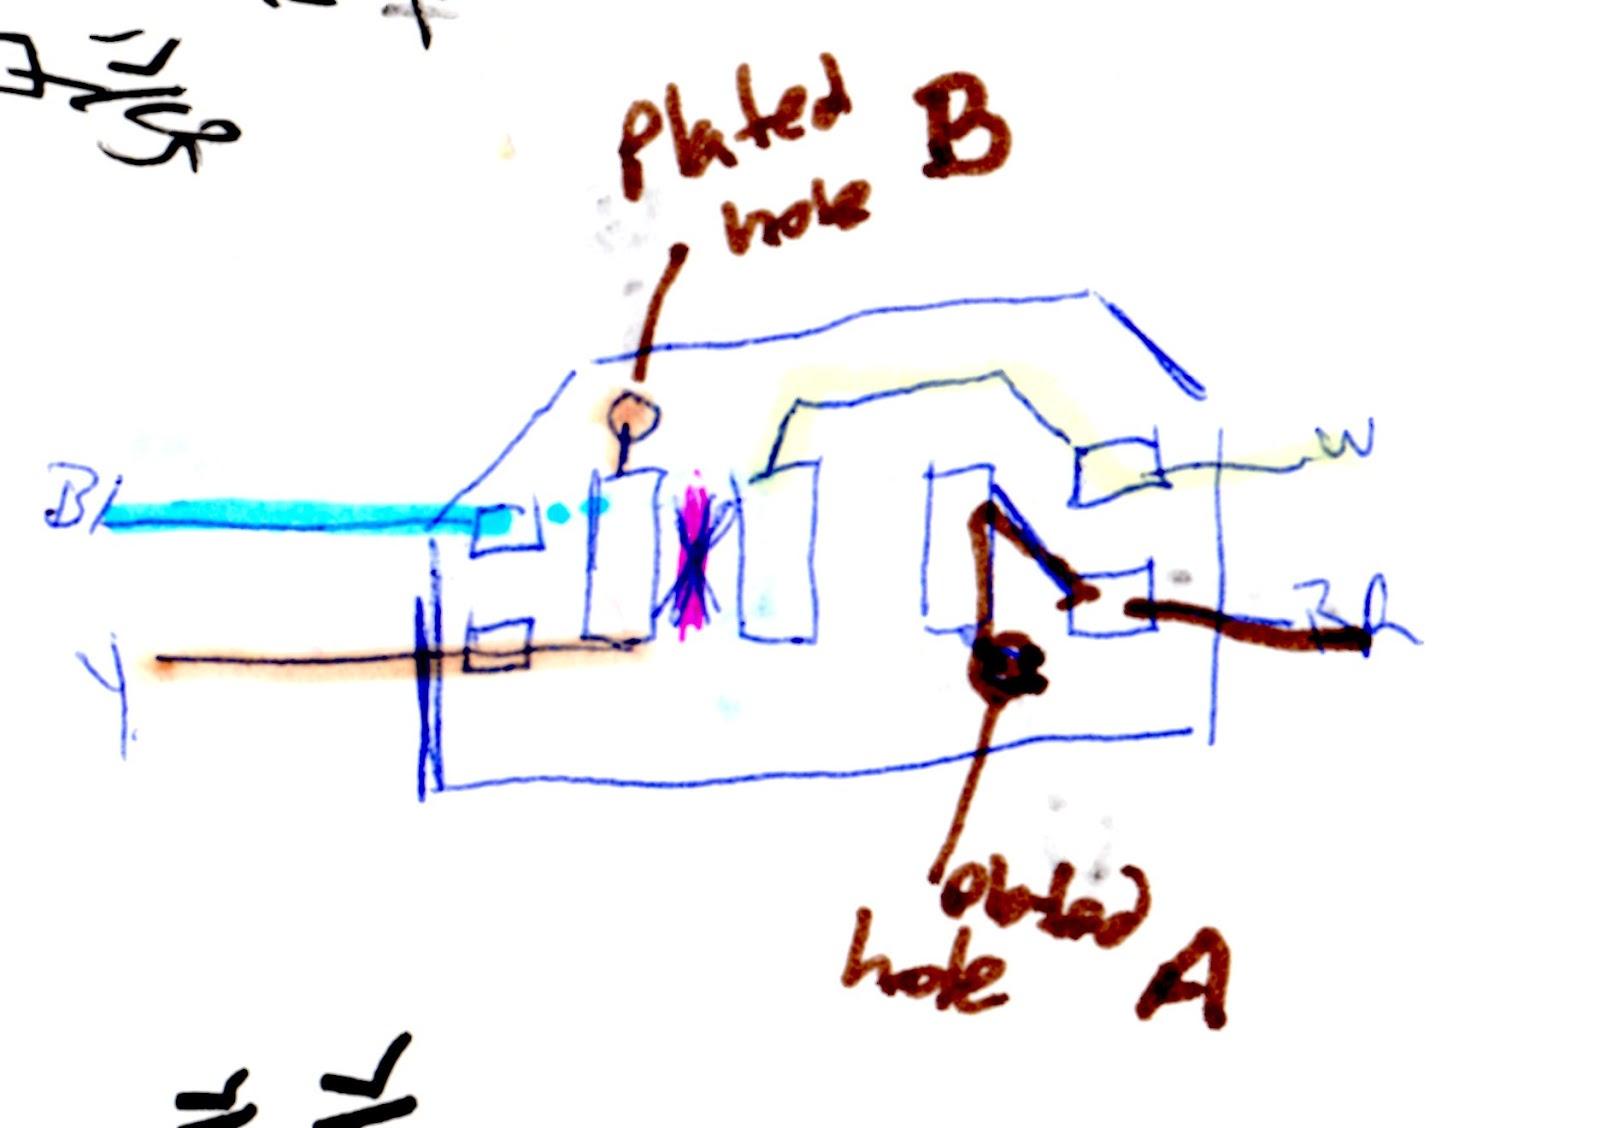 Series Parallel Speaker Wiring Calculator On Wiring A Dcc Decoder